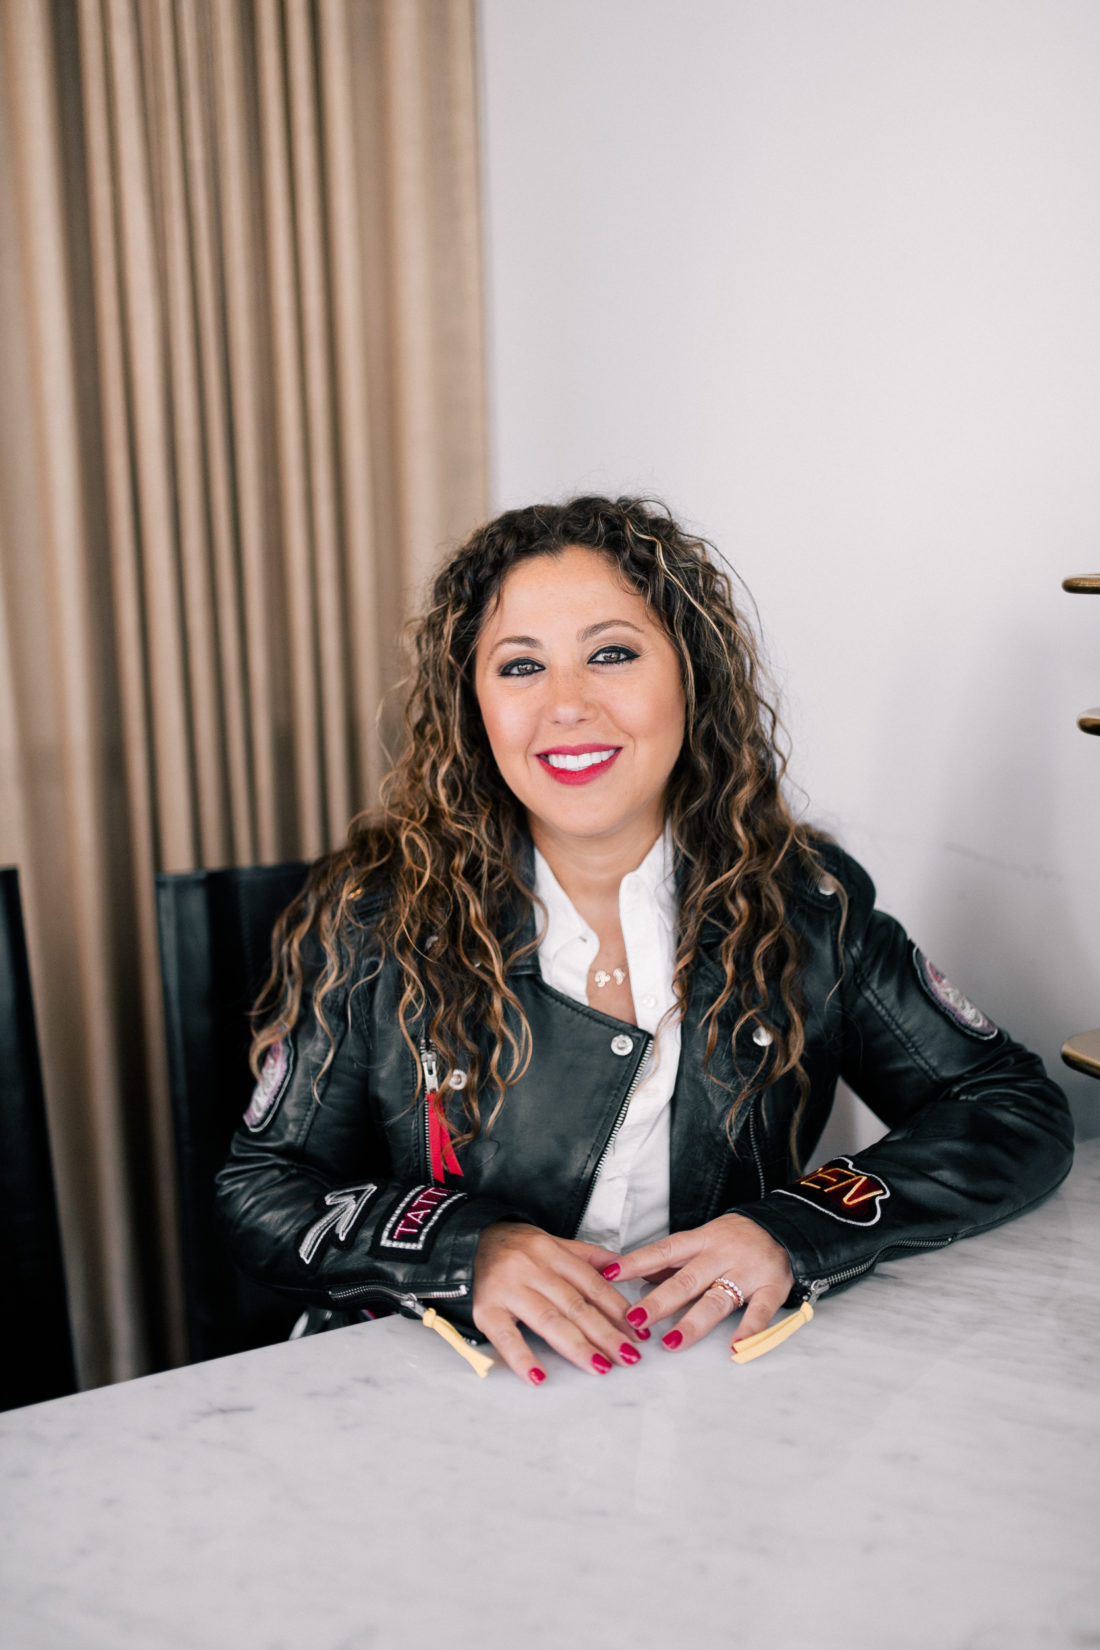 Rita Hazan sits in her salon in New York City